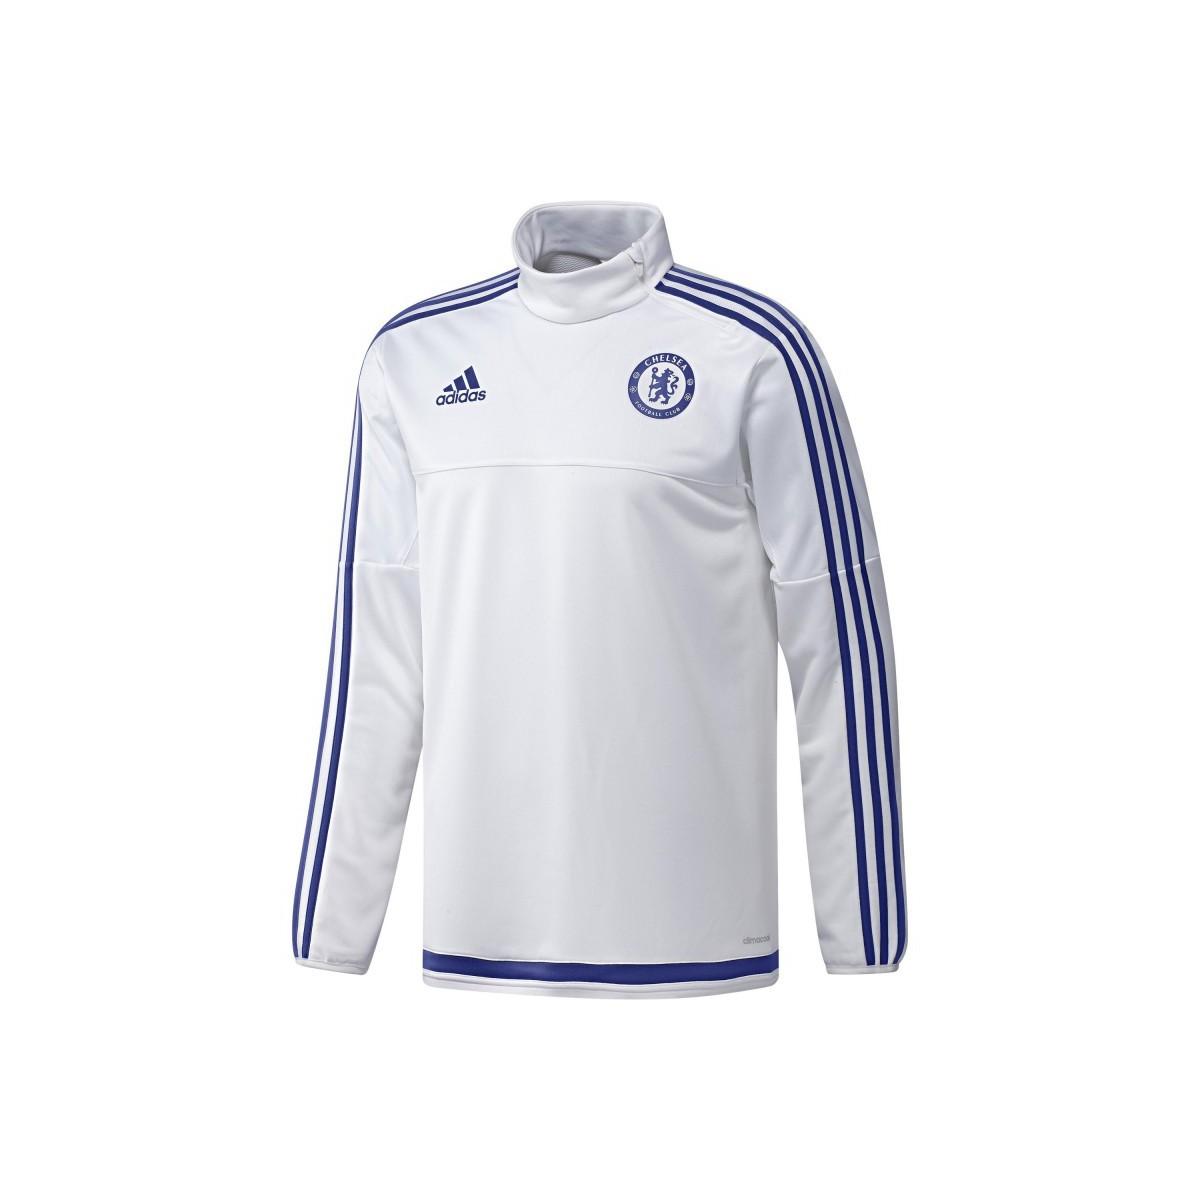 Maillot Adidas Training De Football Performance Fc Chelsea